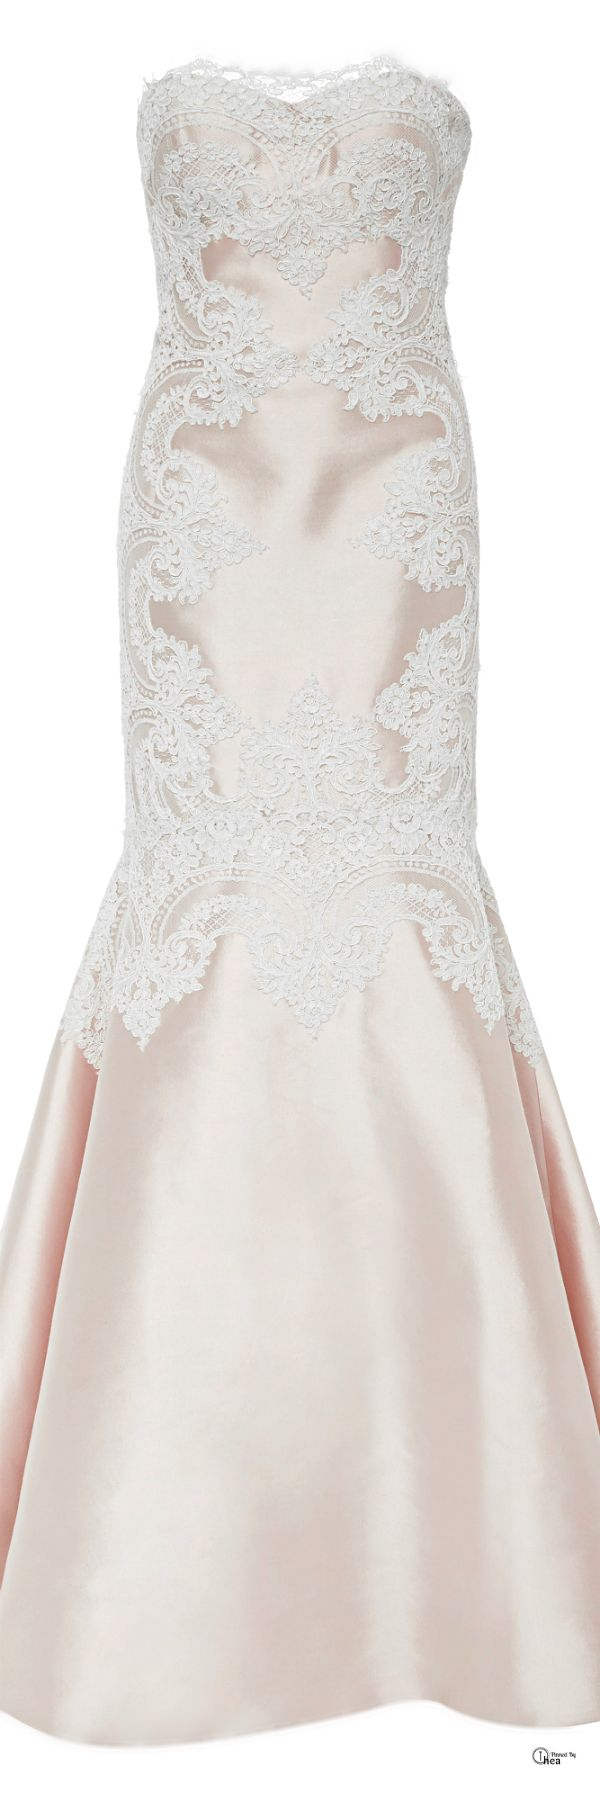 Repurpose wedding dress   best Inspiration images on Pinterest  Wedding frocks Bridal